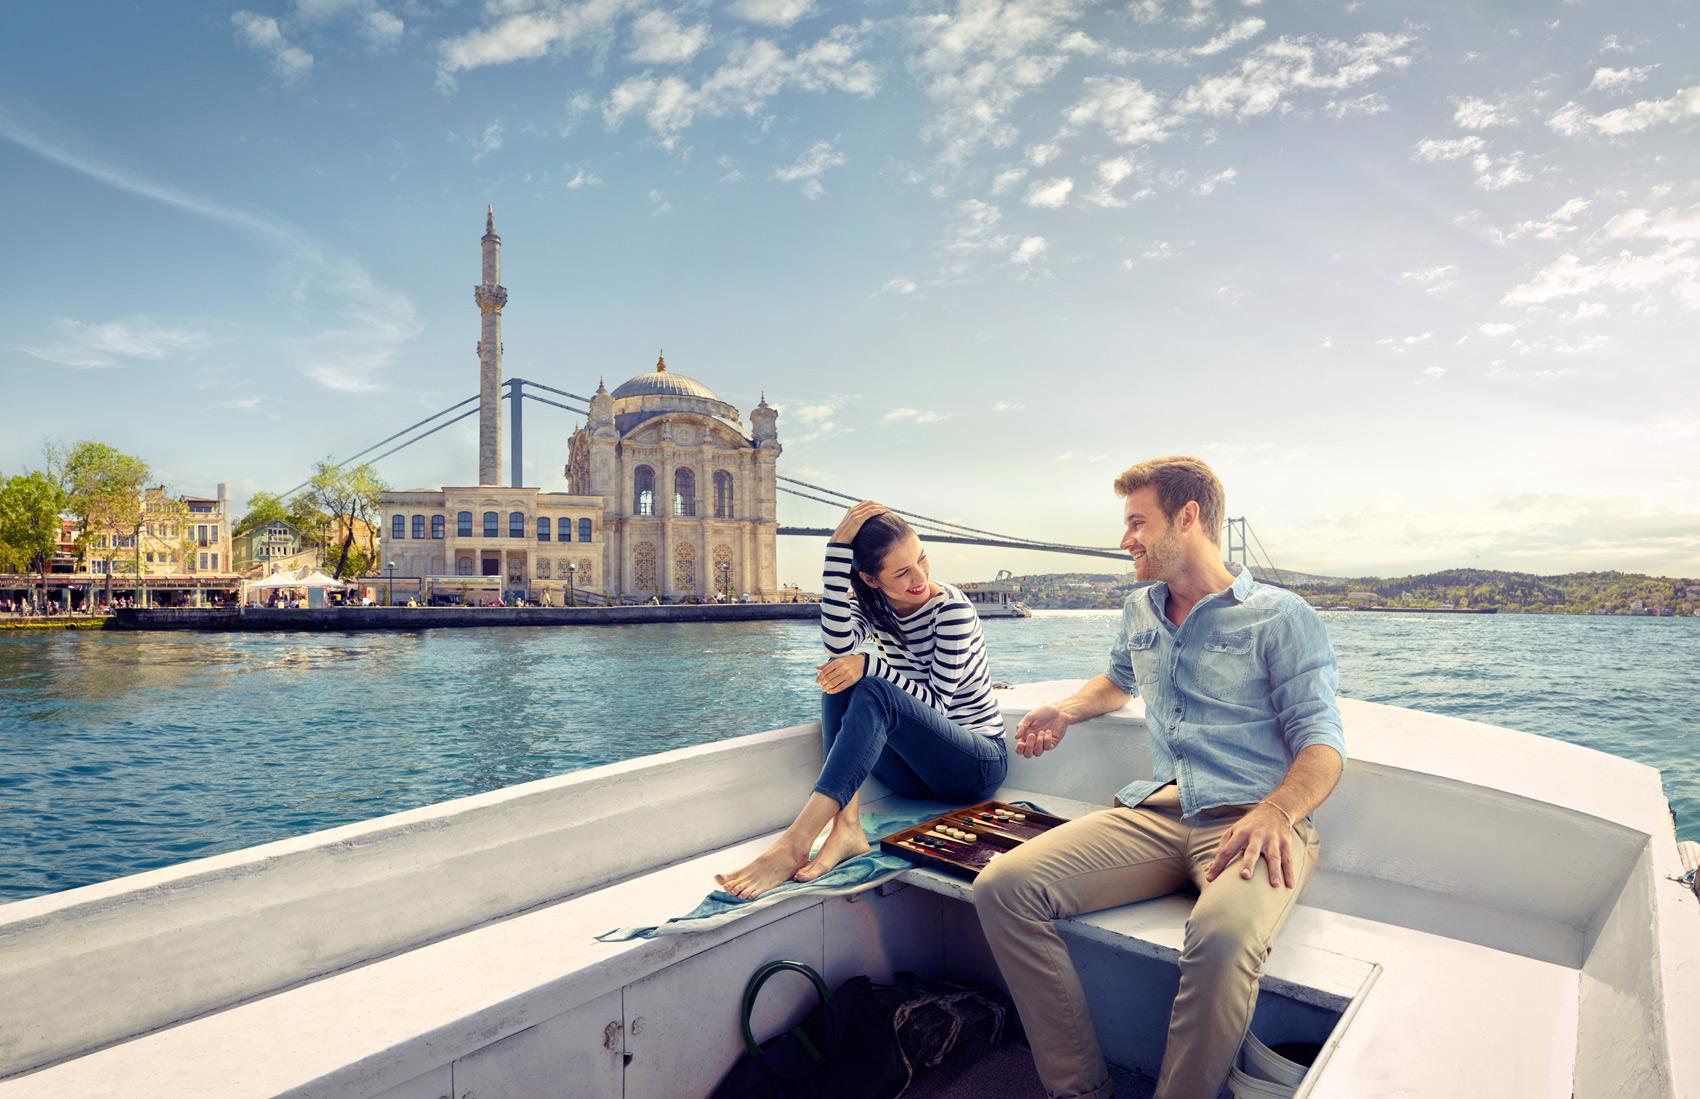 25.EuroTravel_IstanbulBoat_v1b.jpg